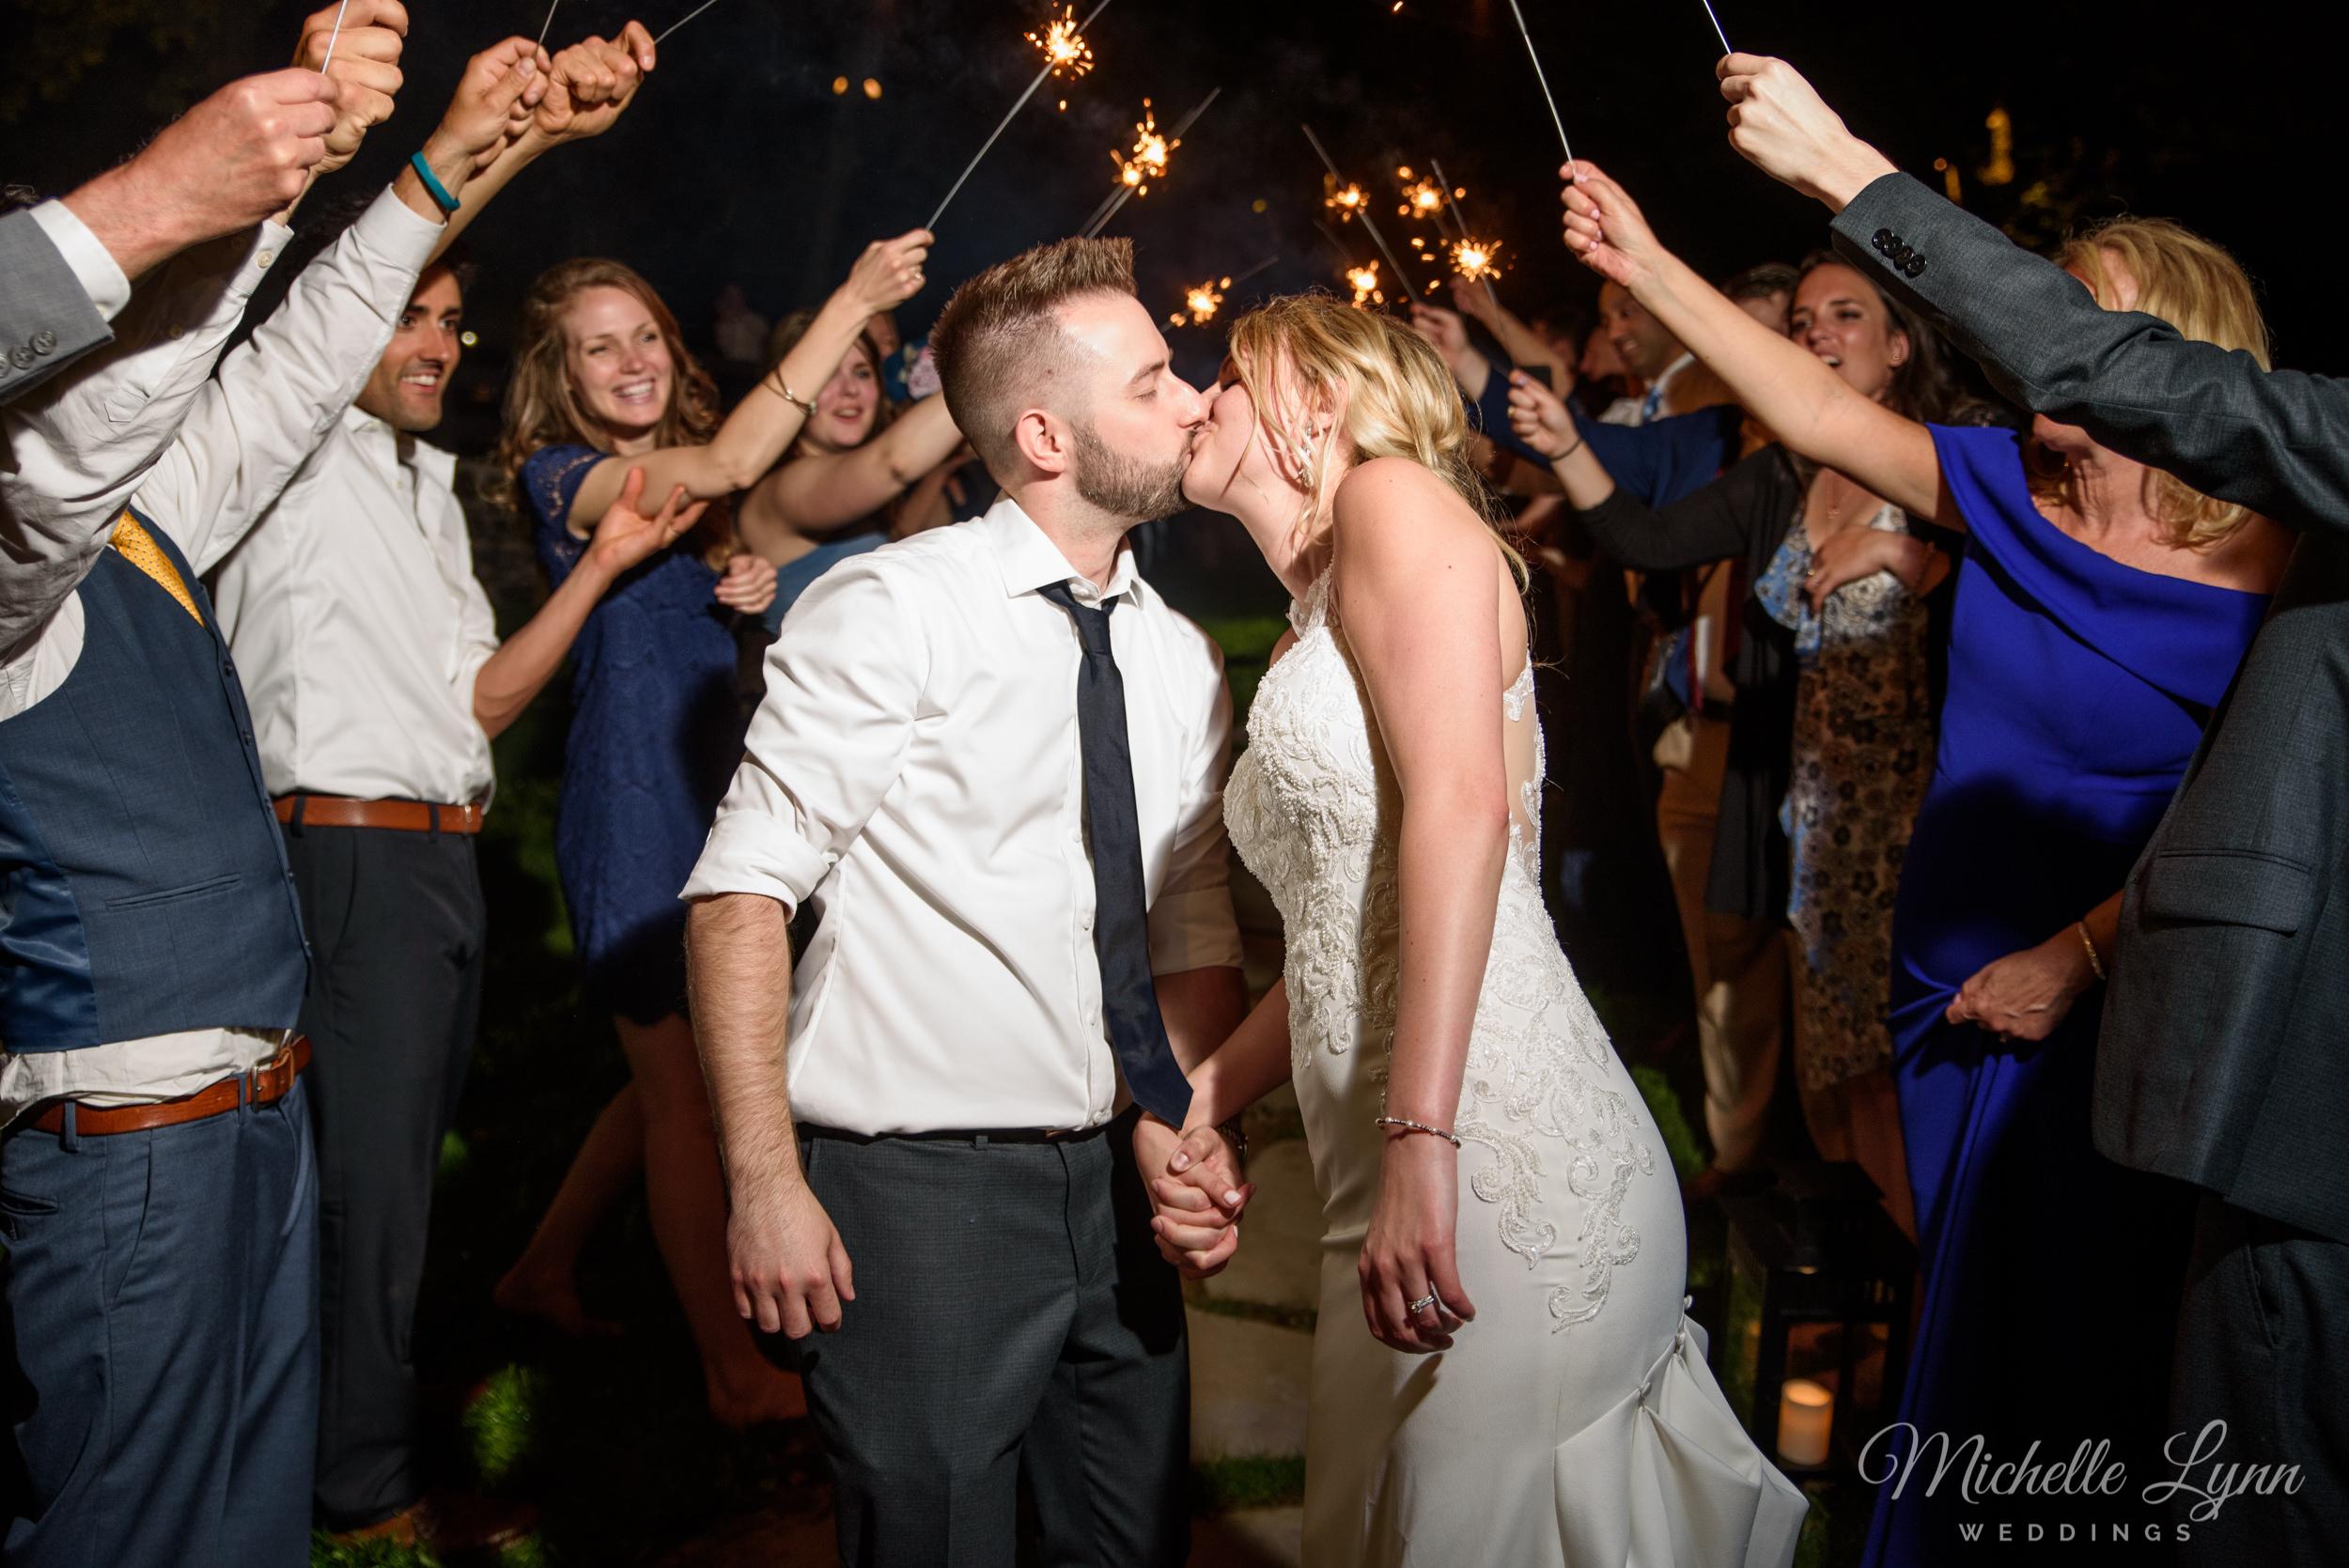 mlw-the-farm-bakery-and-events-wedding-photos-99.jpg